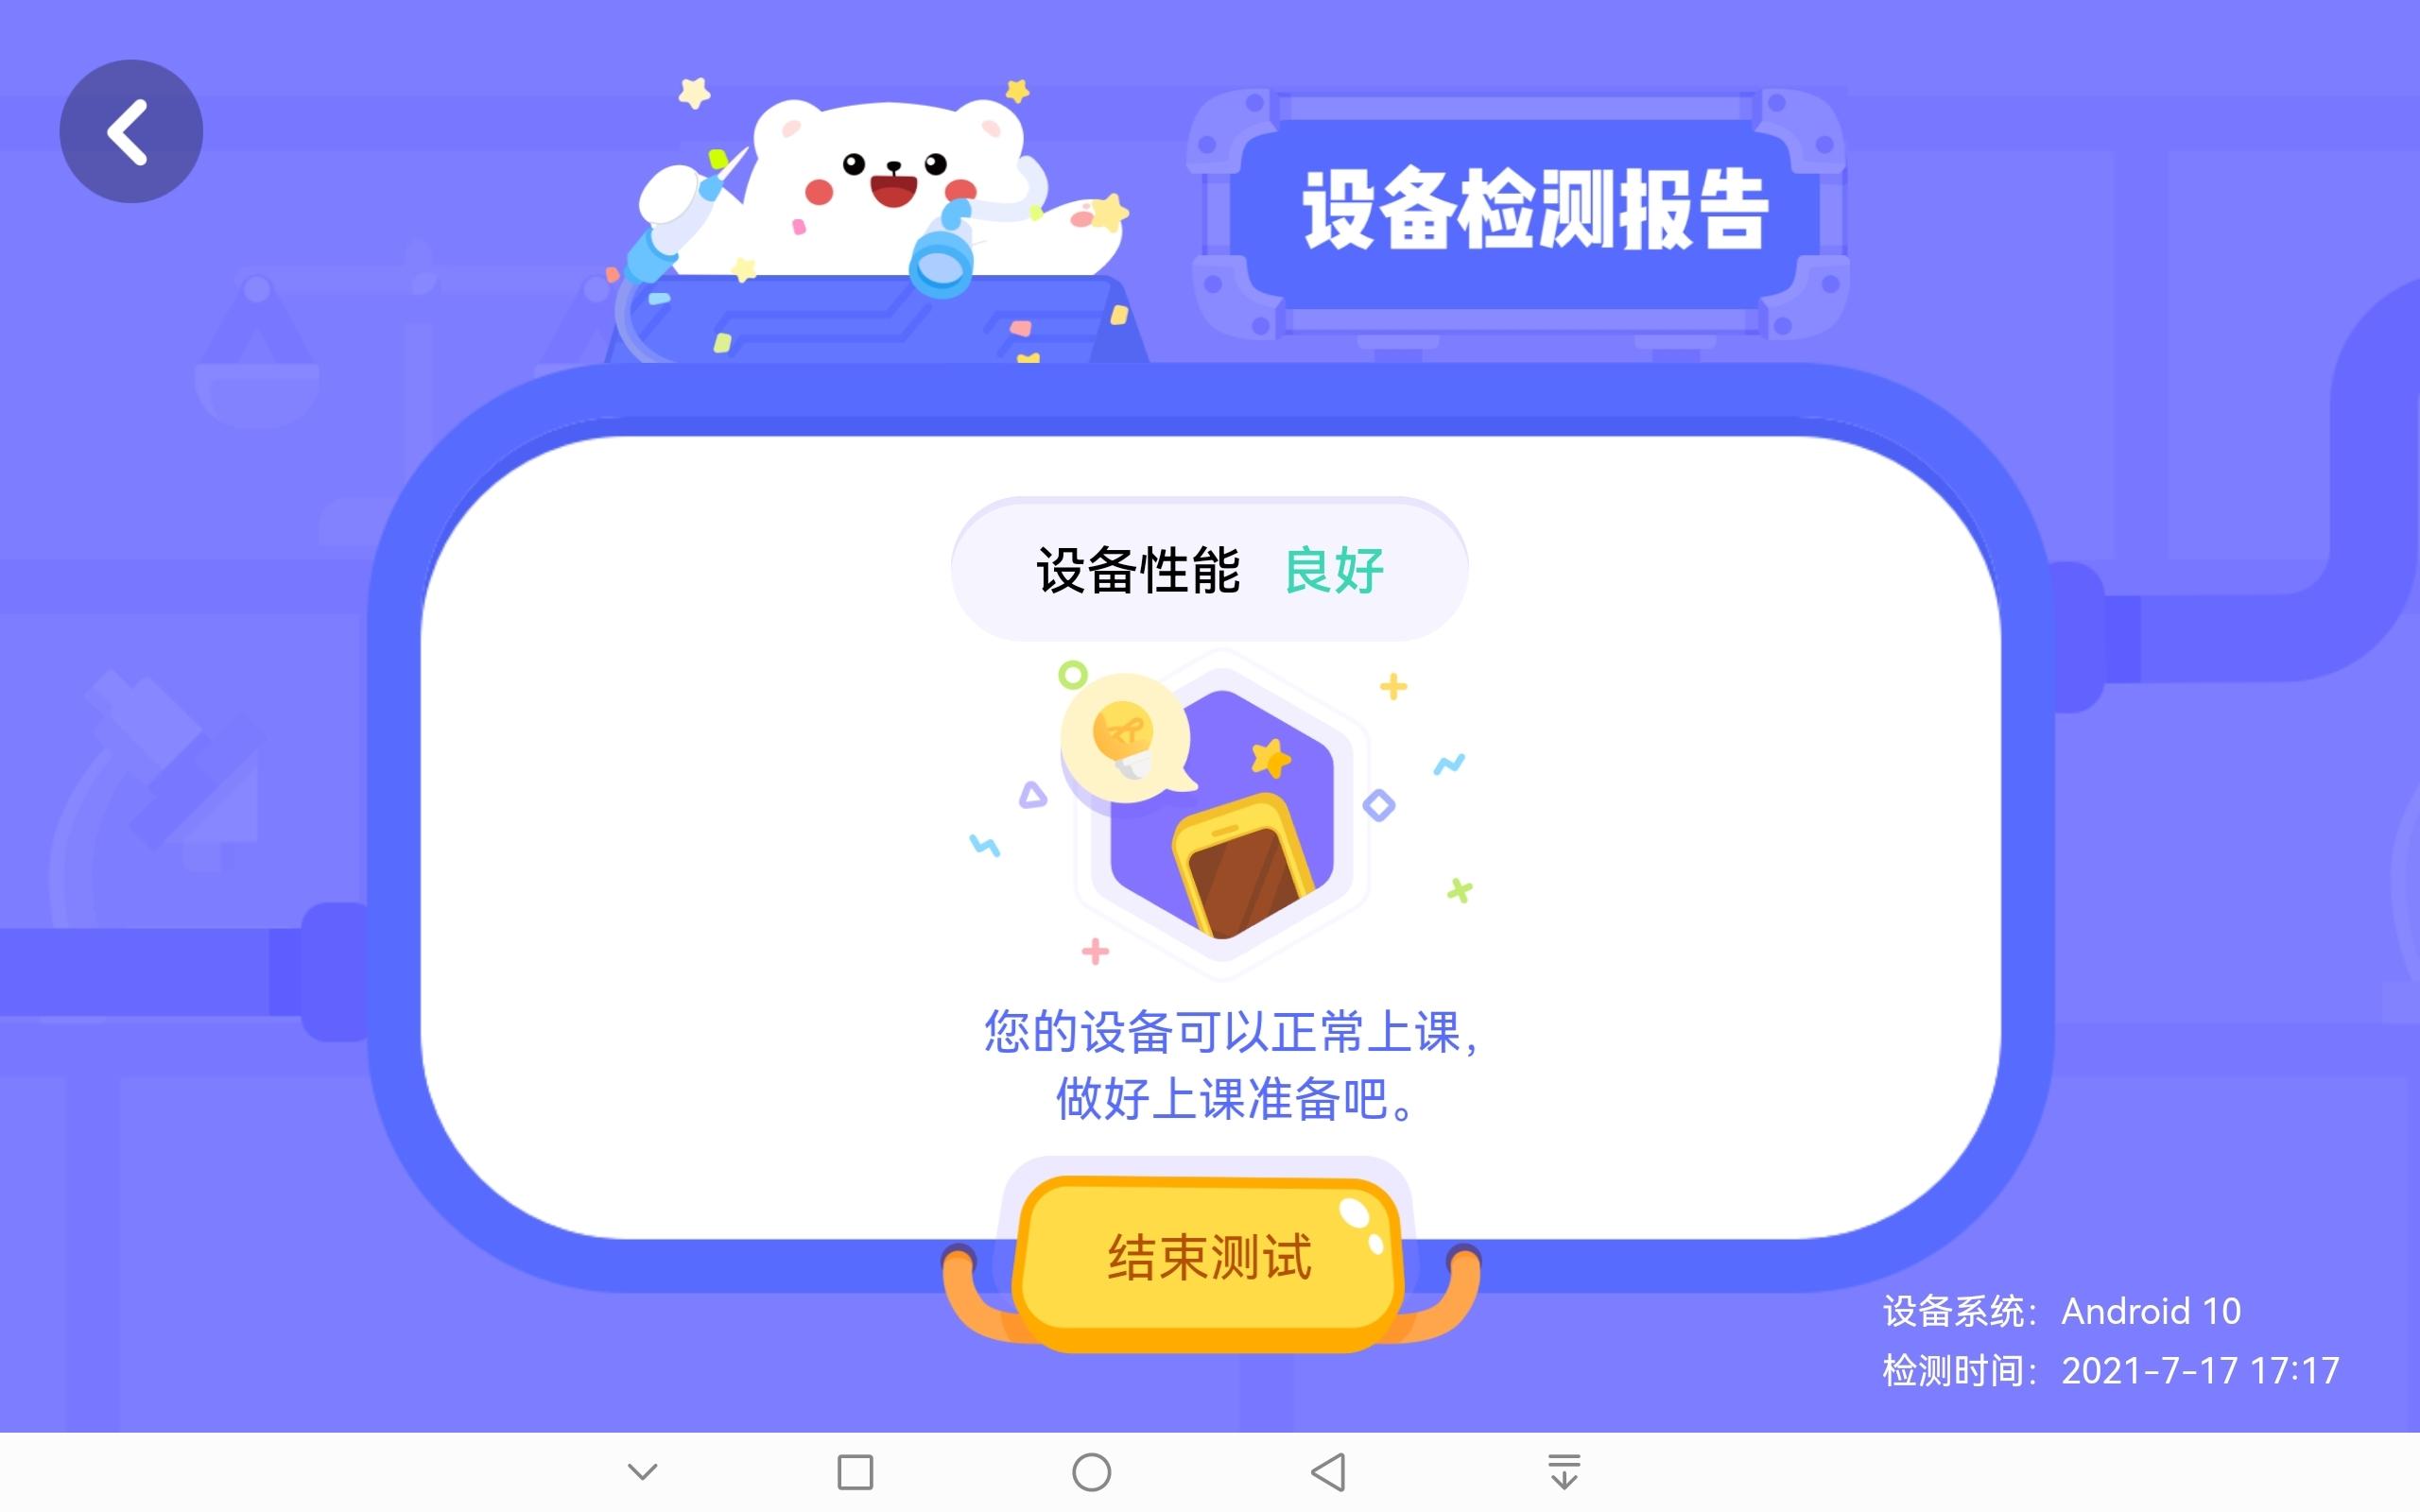 Screenshot_20210717_171723_com.zuoyebang.airclass.jpg